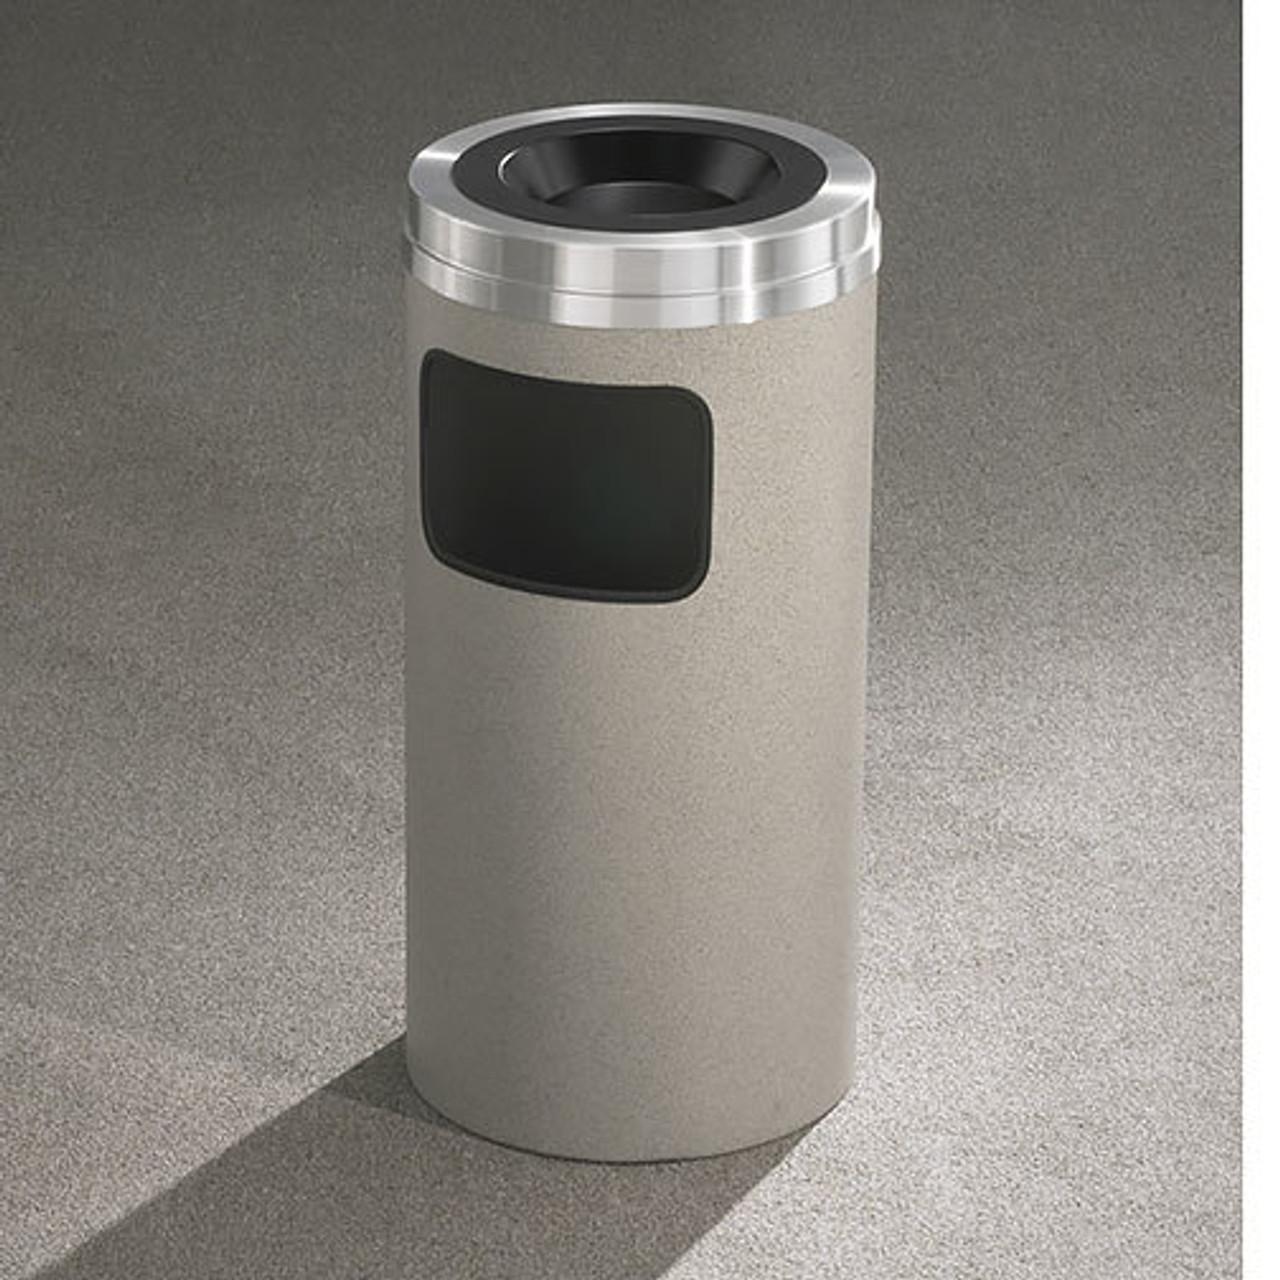 Glaro Mount Everest Ash & Trash - Aluminum Top